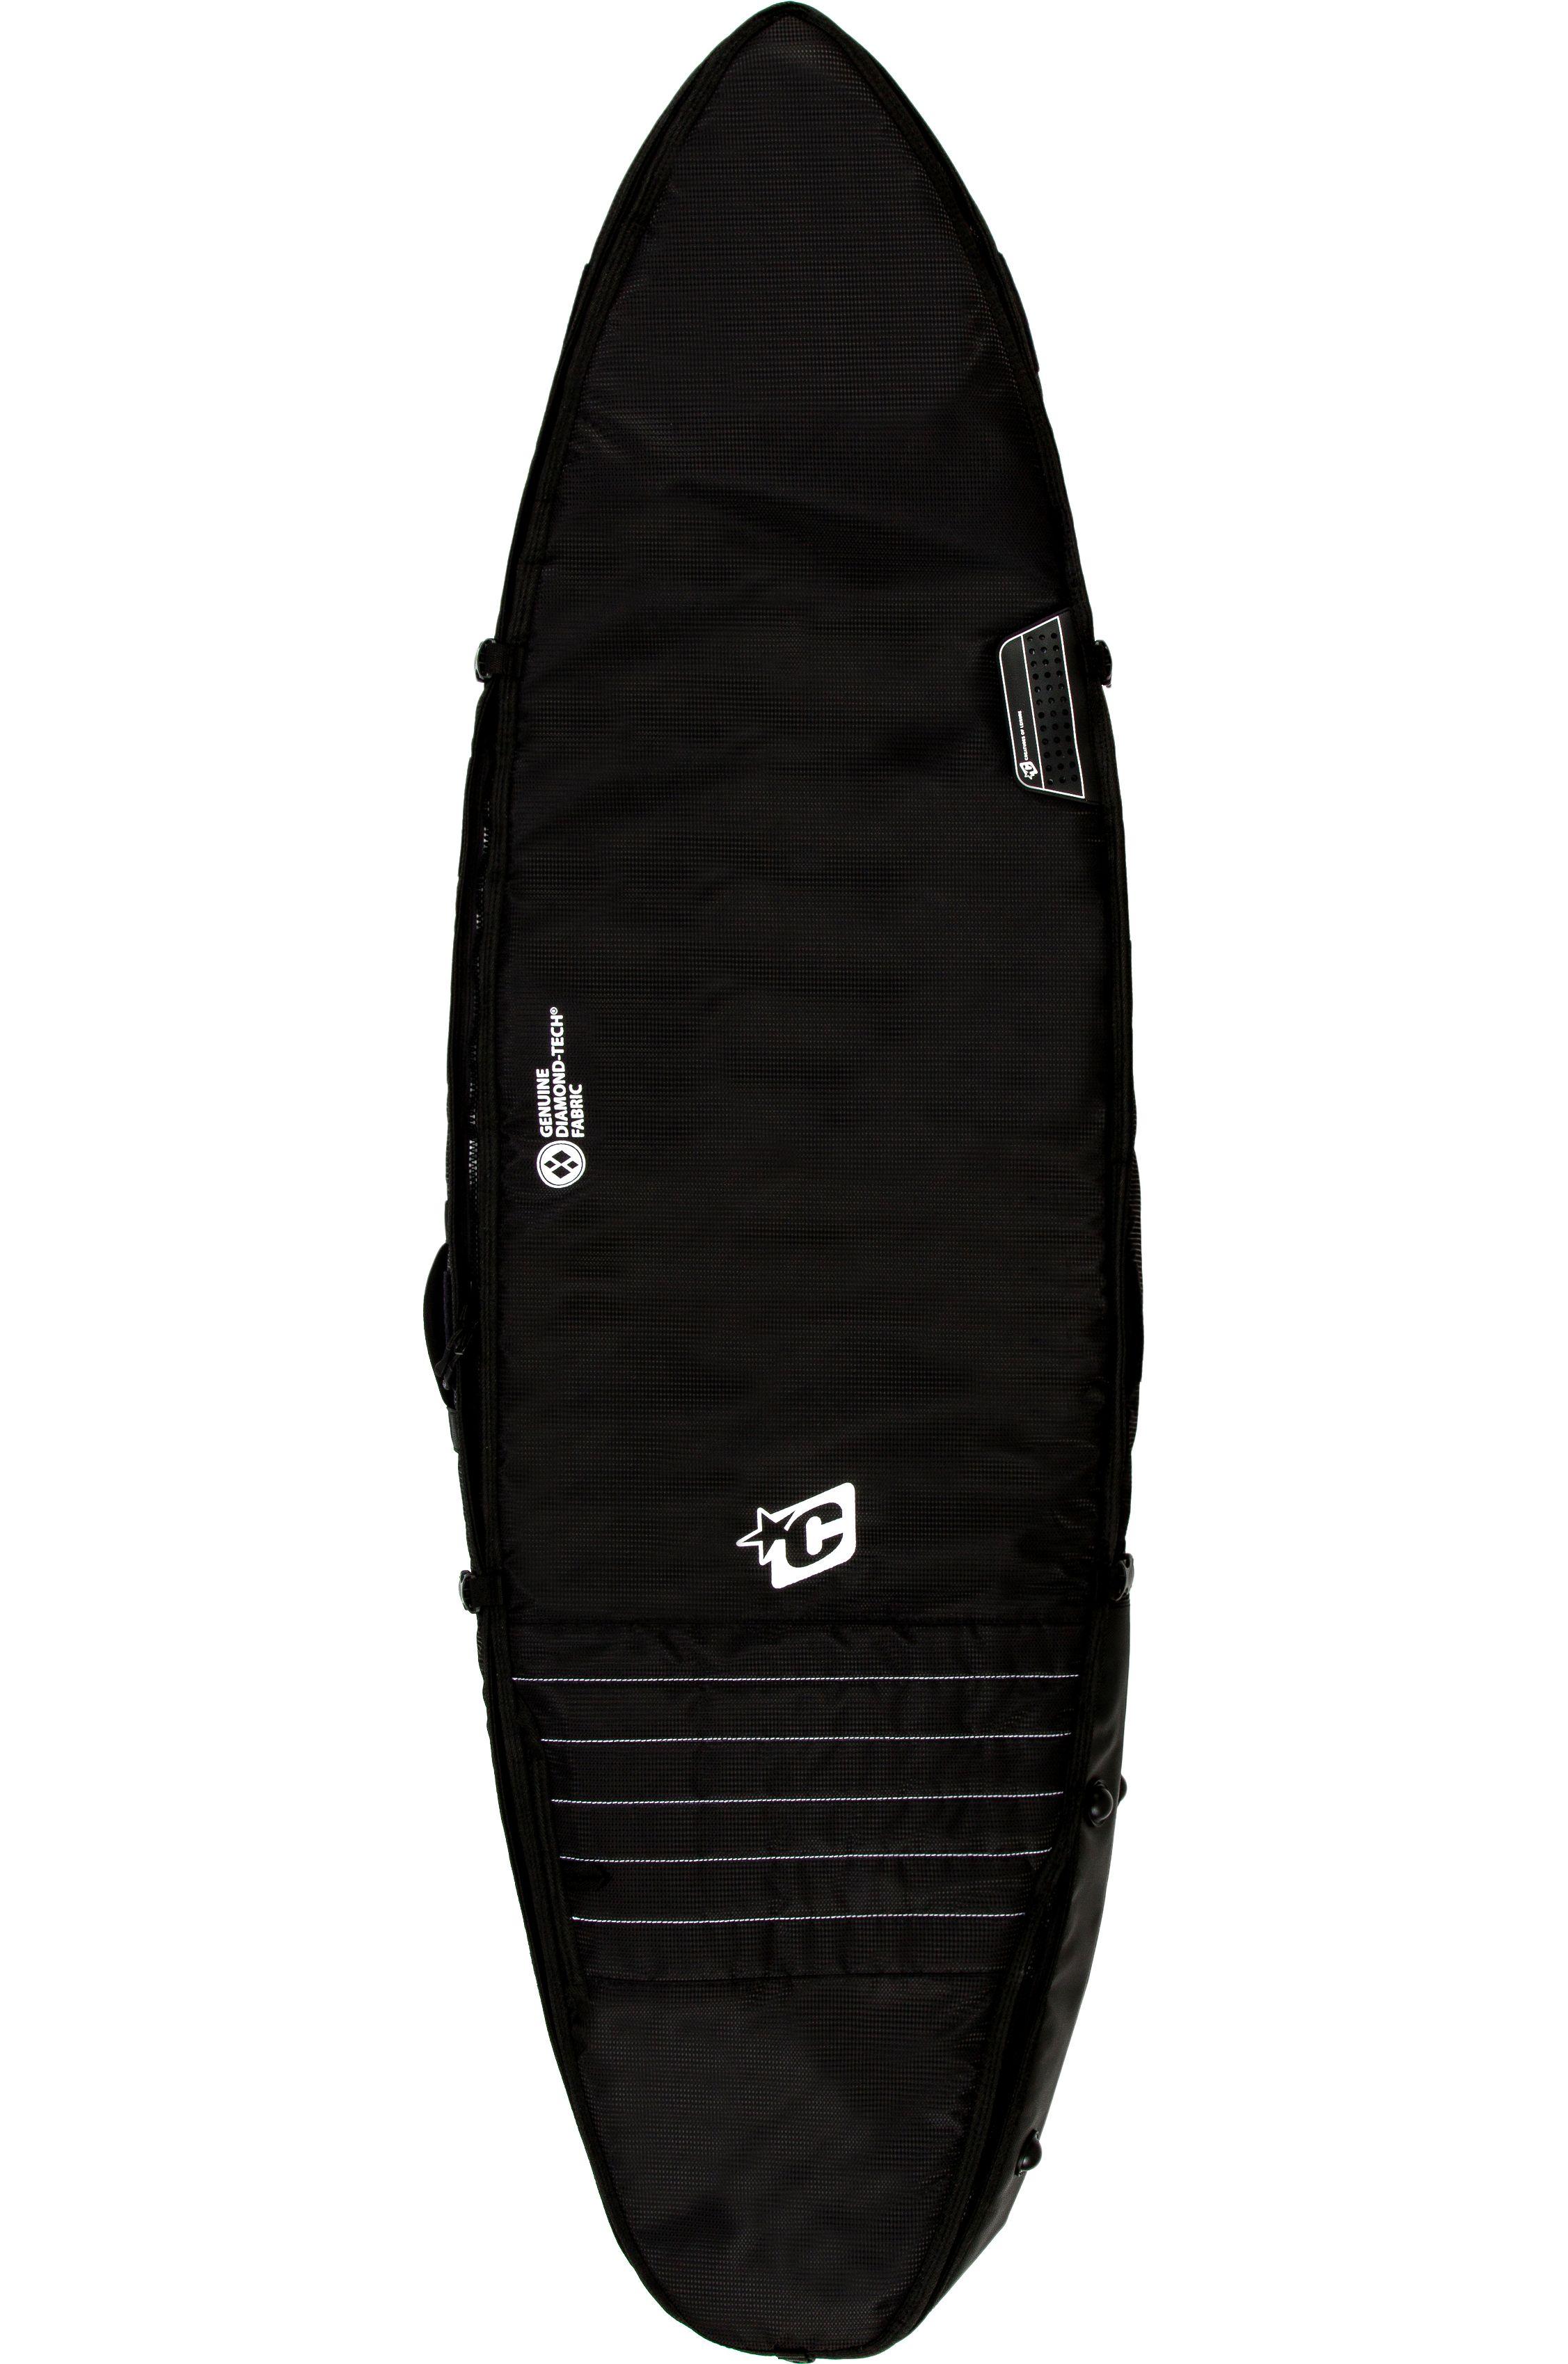 Capa Creatures 6'3 SHORTBOARD TRIPLE Black White